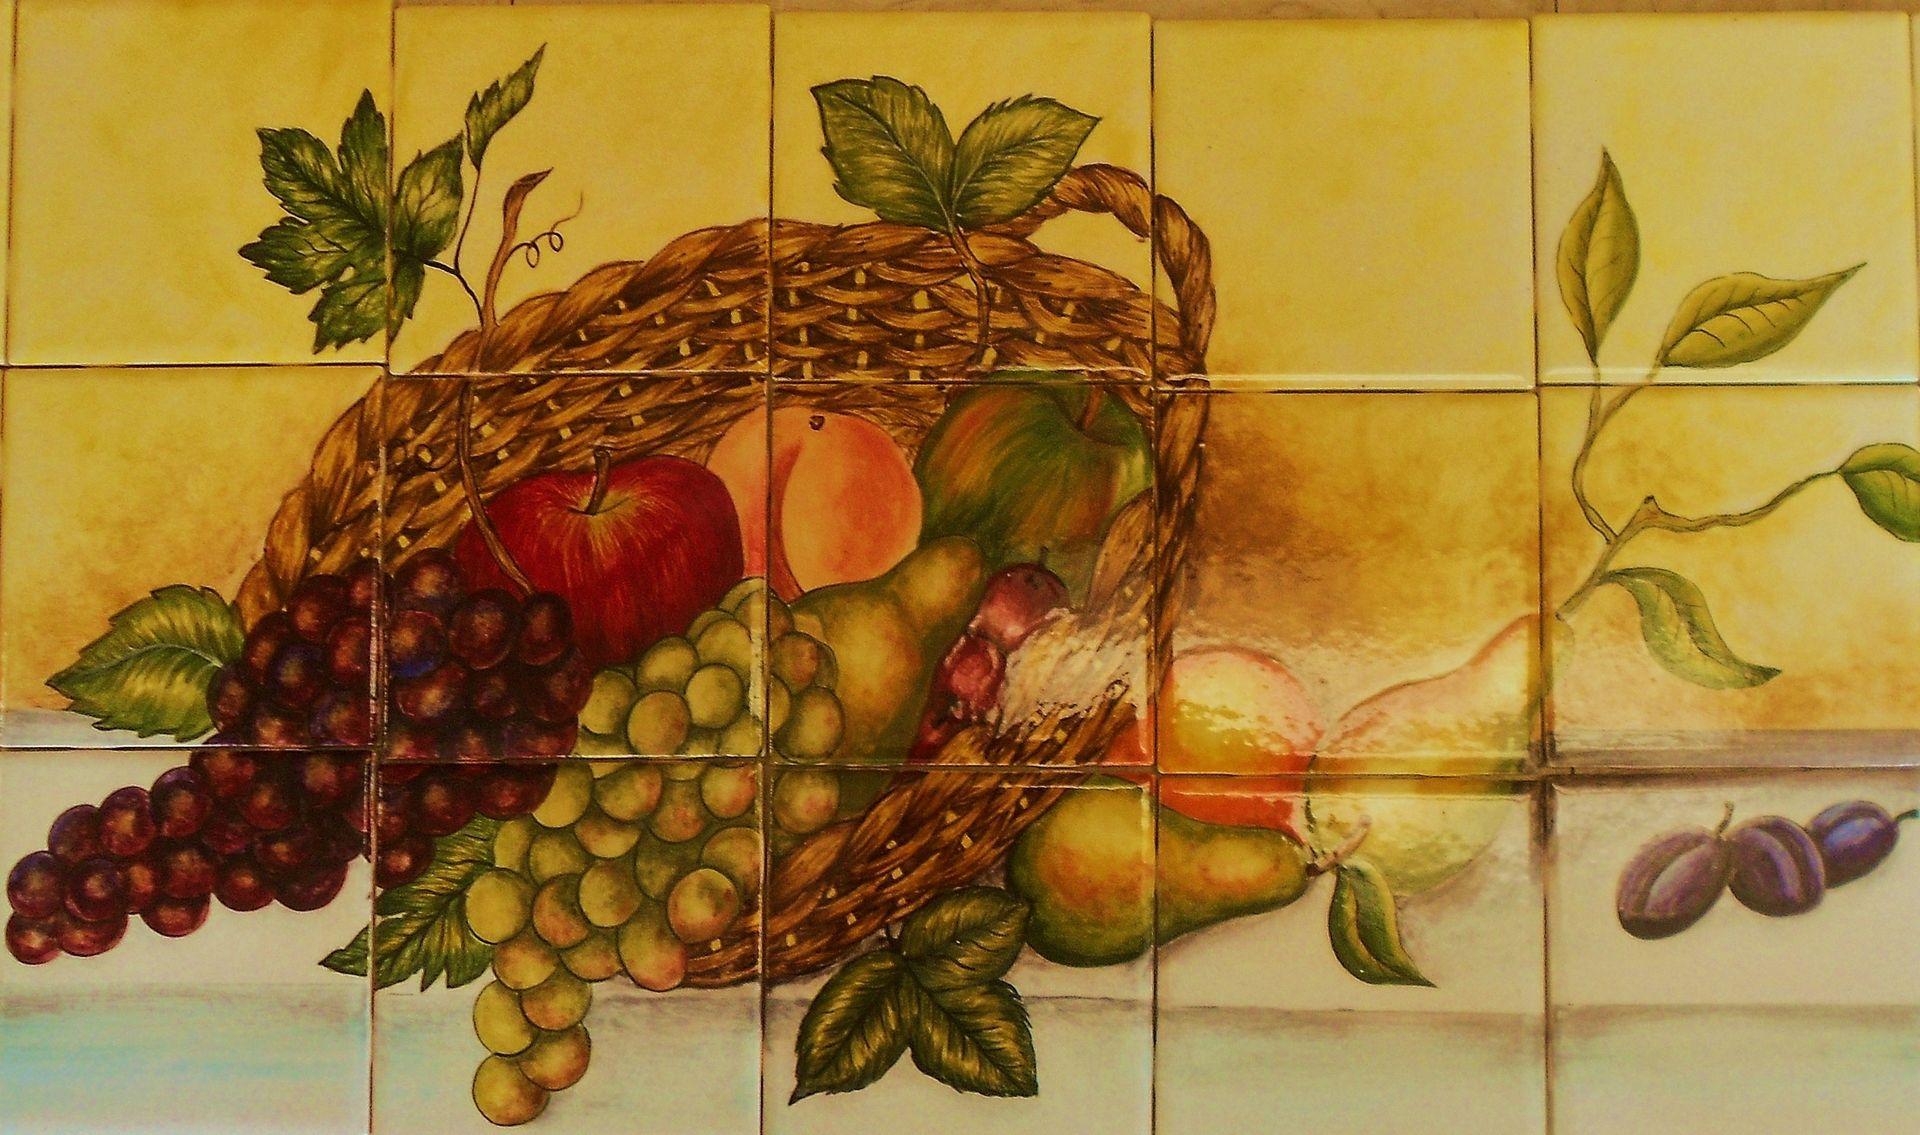 Handmade fruits basket hand painted ceramic tile mural by lomeli custom made fruits basket hand painted ceramic tile mural dailygadgetfo Image collections